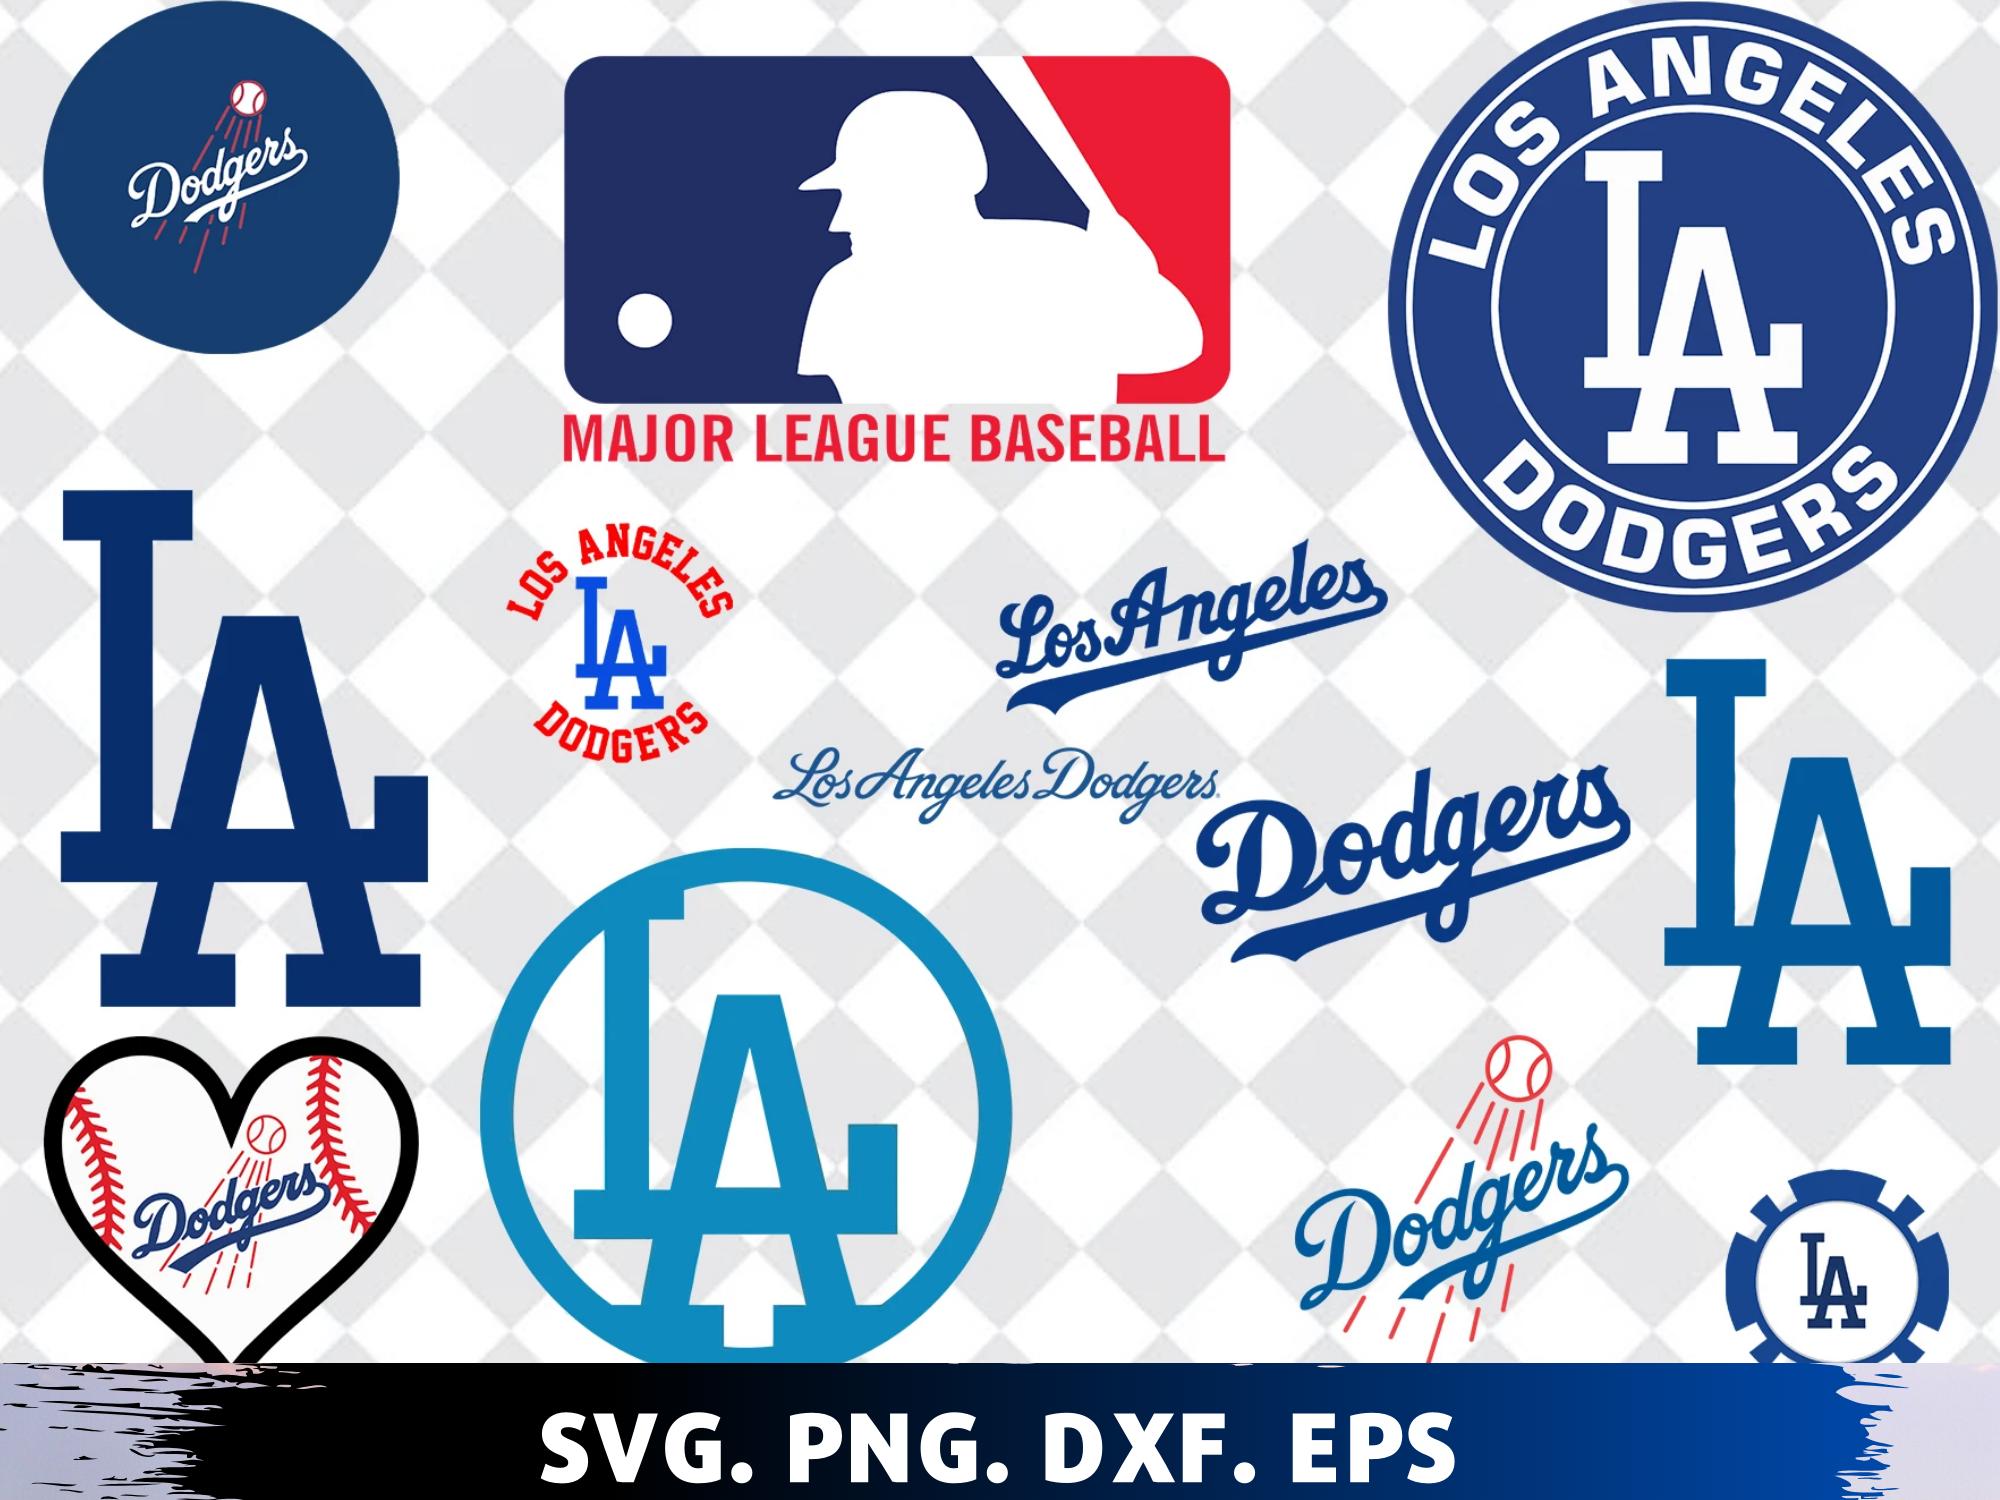 Clipartshop Los Angeles Dodgers Los Angeles Dodgers Svg Los Angeles Dodgers Logo Los Angeles Dodgers Clipart Los Angeles Dodgers Cricut In 2020 Personalized T Shirts Clip Art Dodgers